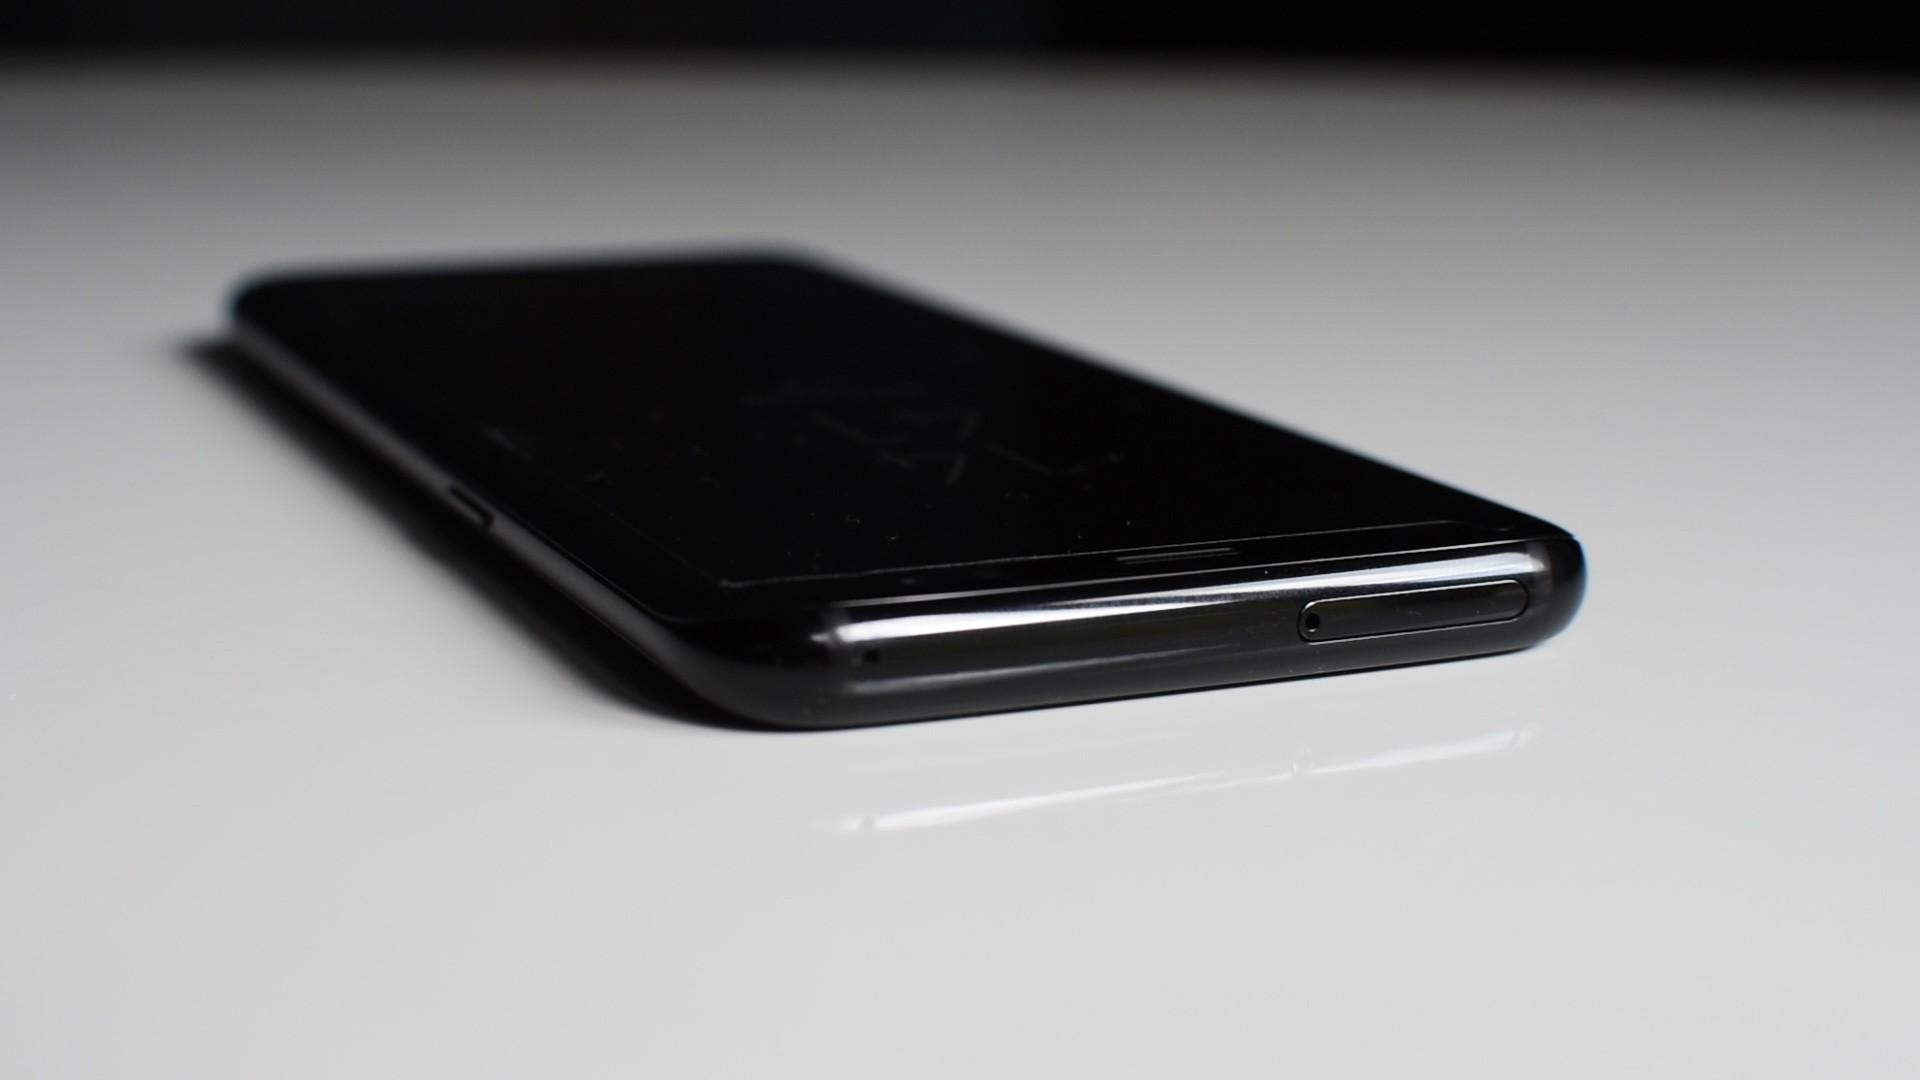 Samsung Galaxy S8: #Recensione Ita da newsdigitali.com